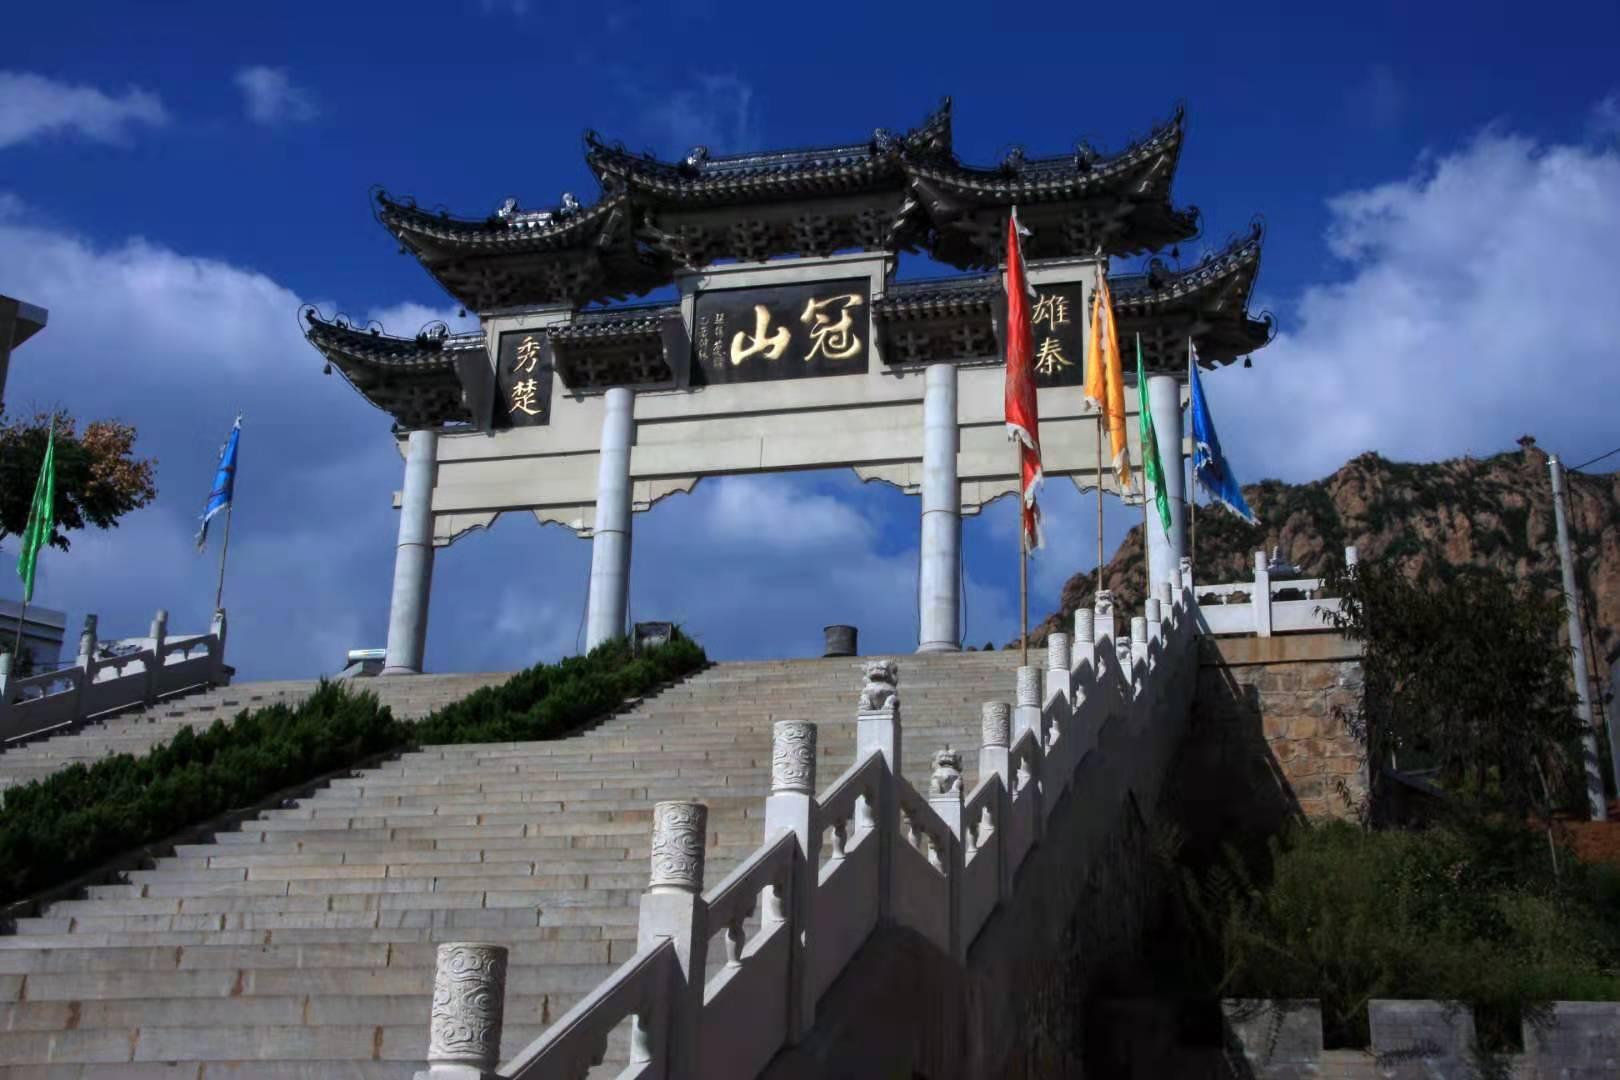 Fengguanshanziran Sceneic Area